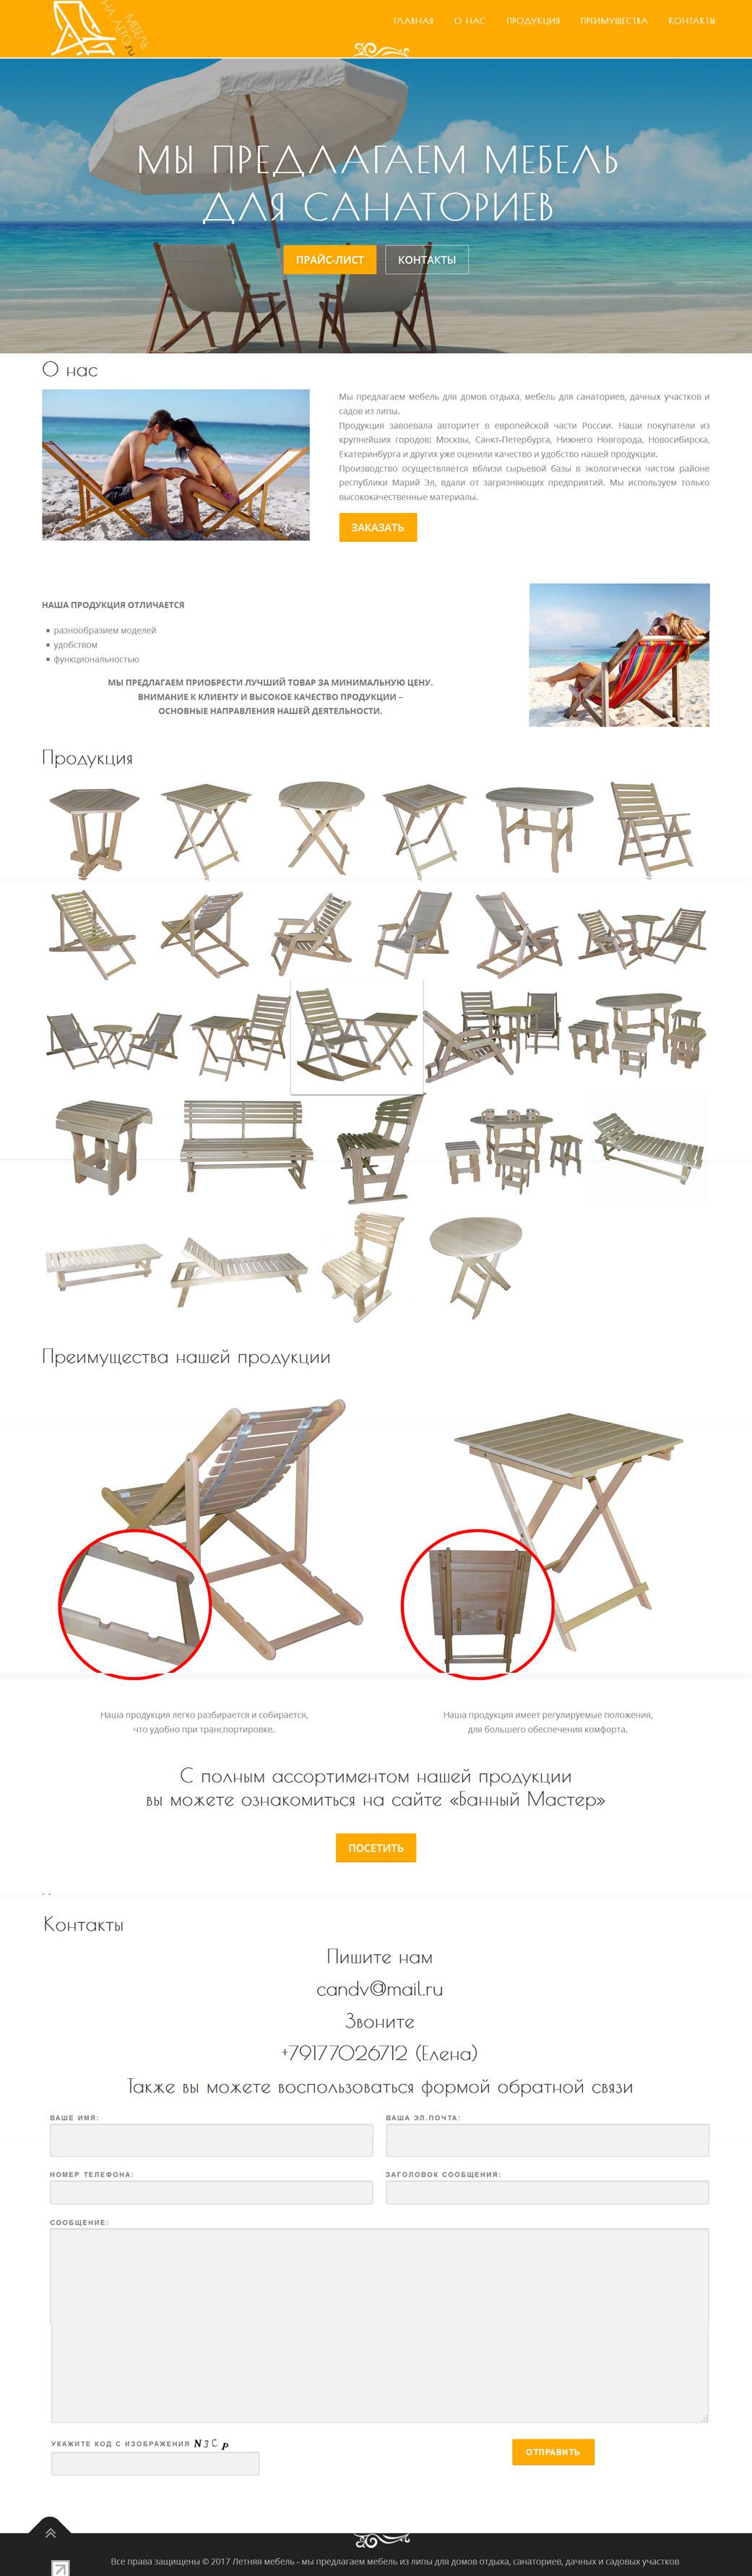 Mebelnaleto.ru - Каталог дачной мебели